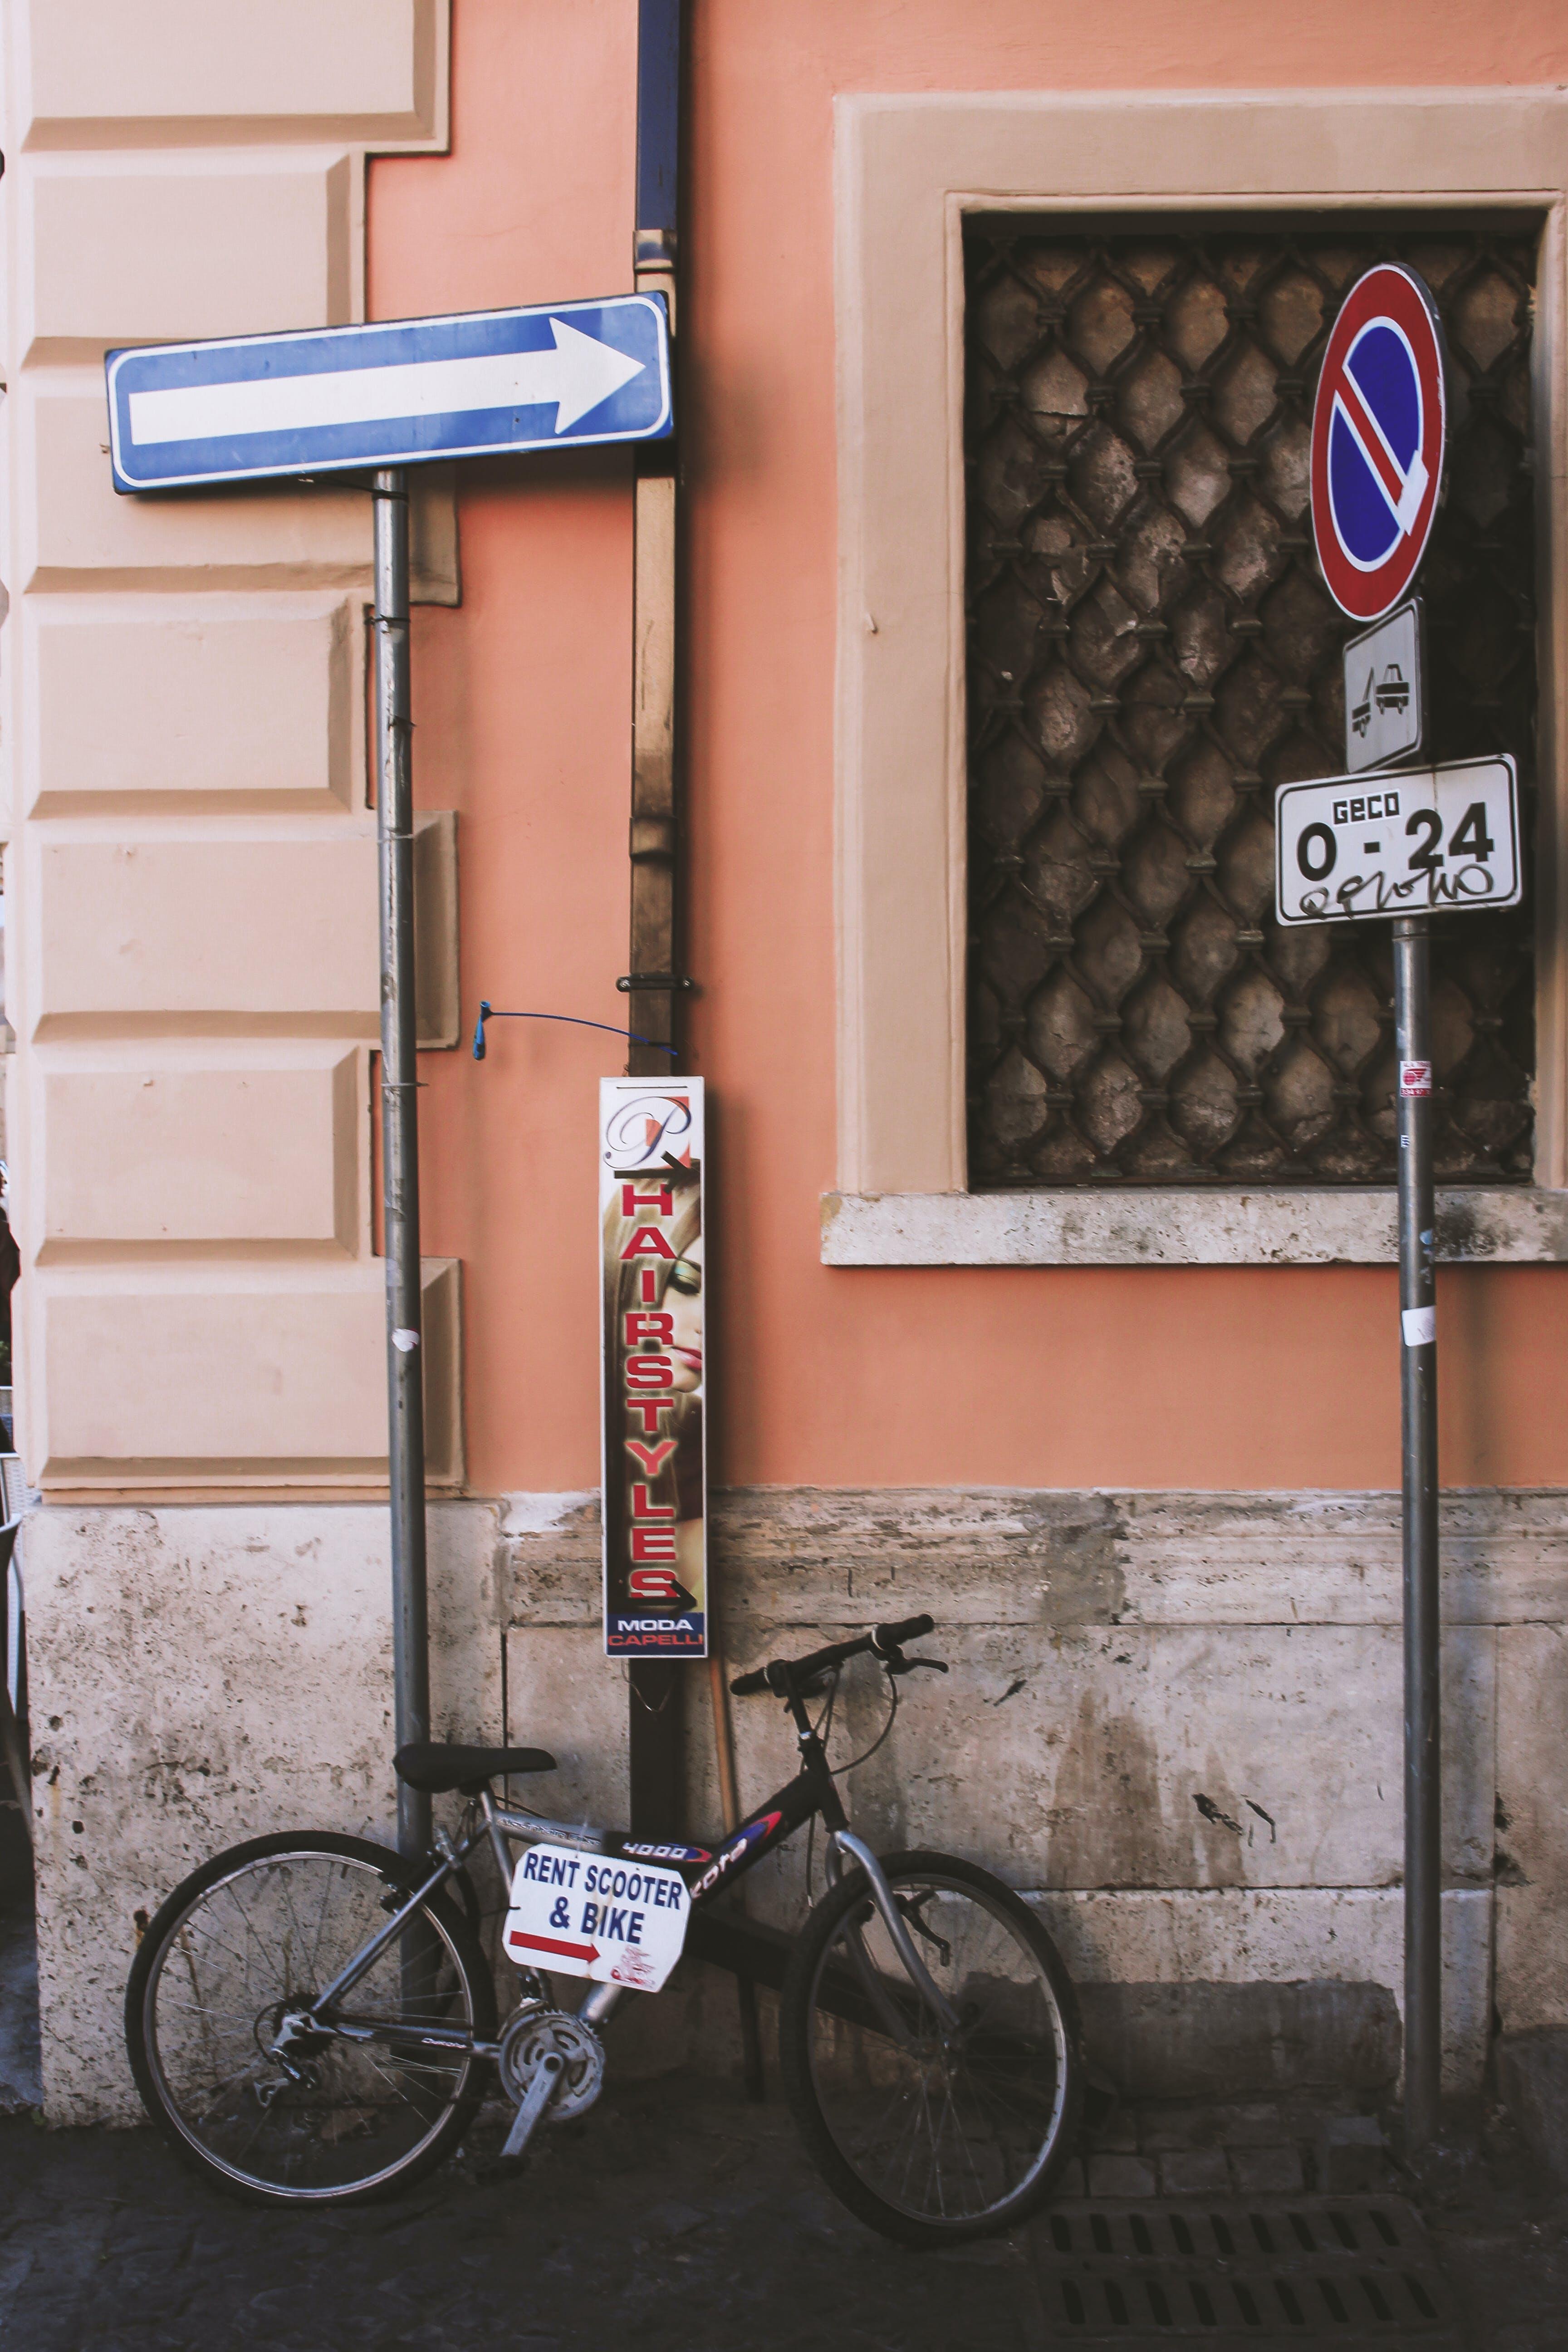 Black Full-suspension Bike on Road